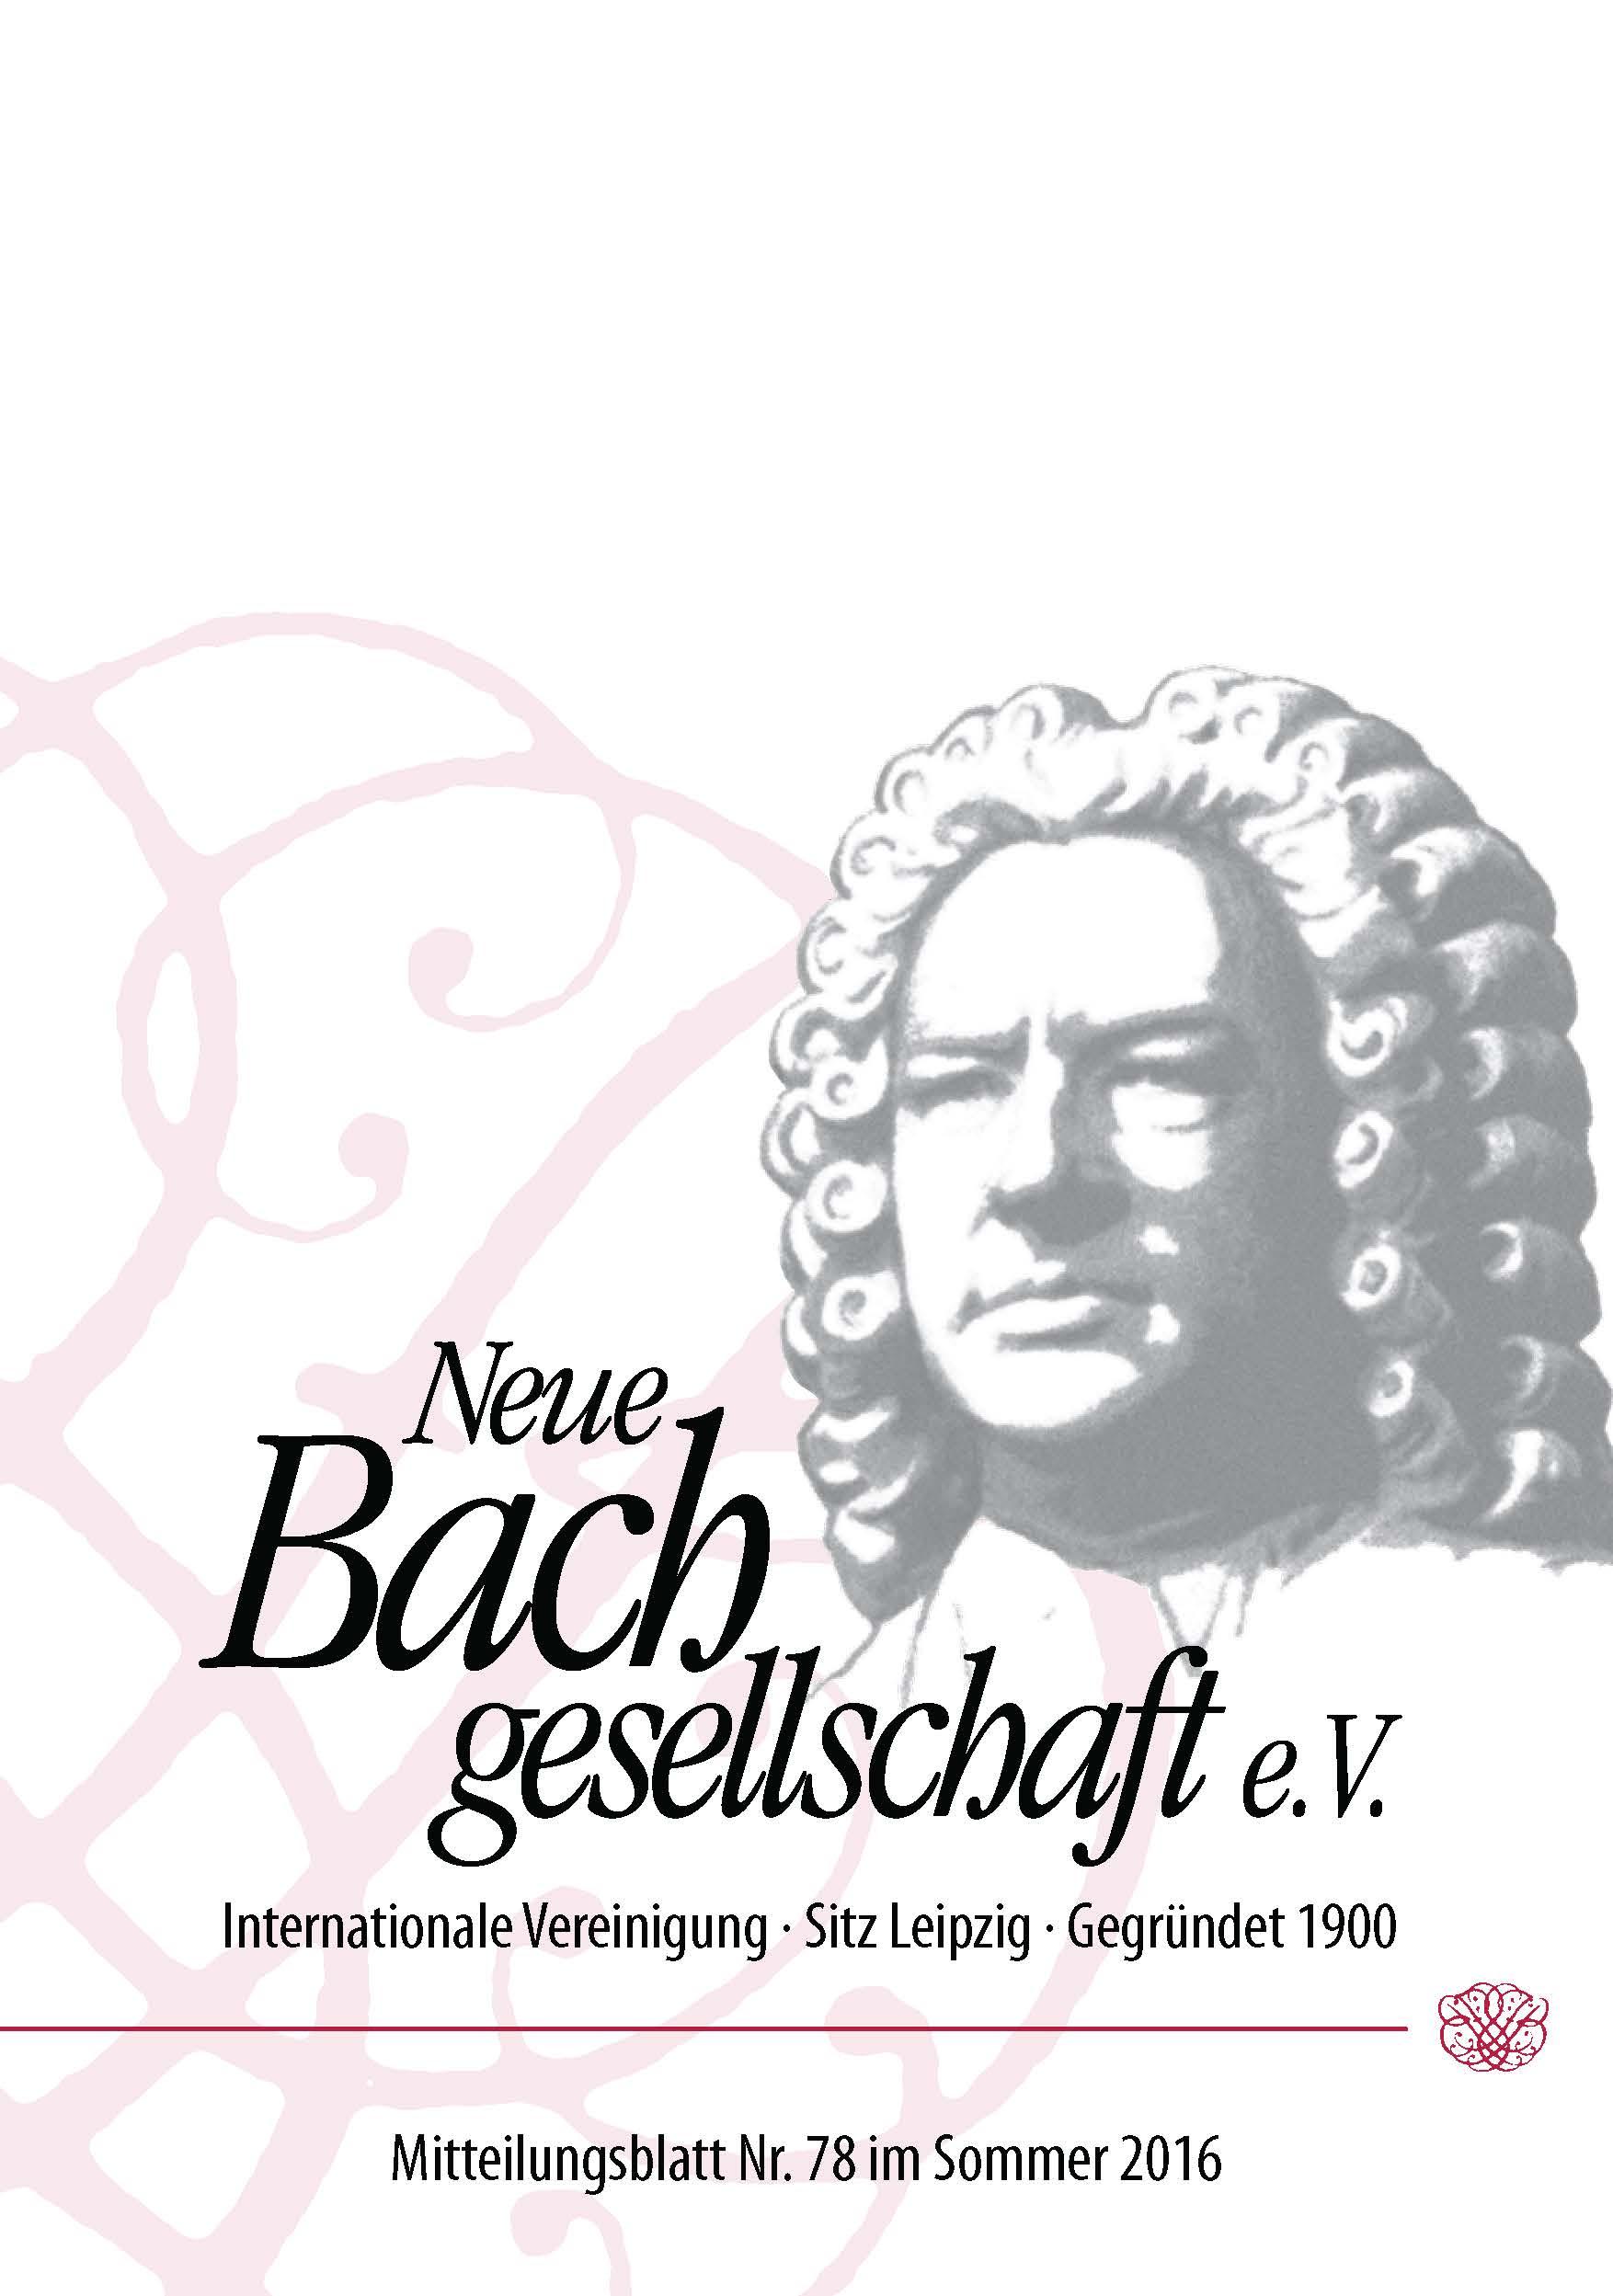 Deckblatt Aus Mitteilungsblatt 78 22 07 16 Neue Bachgesellschaft